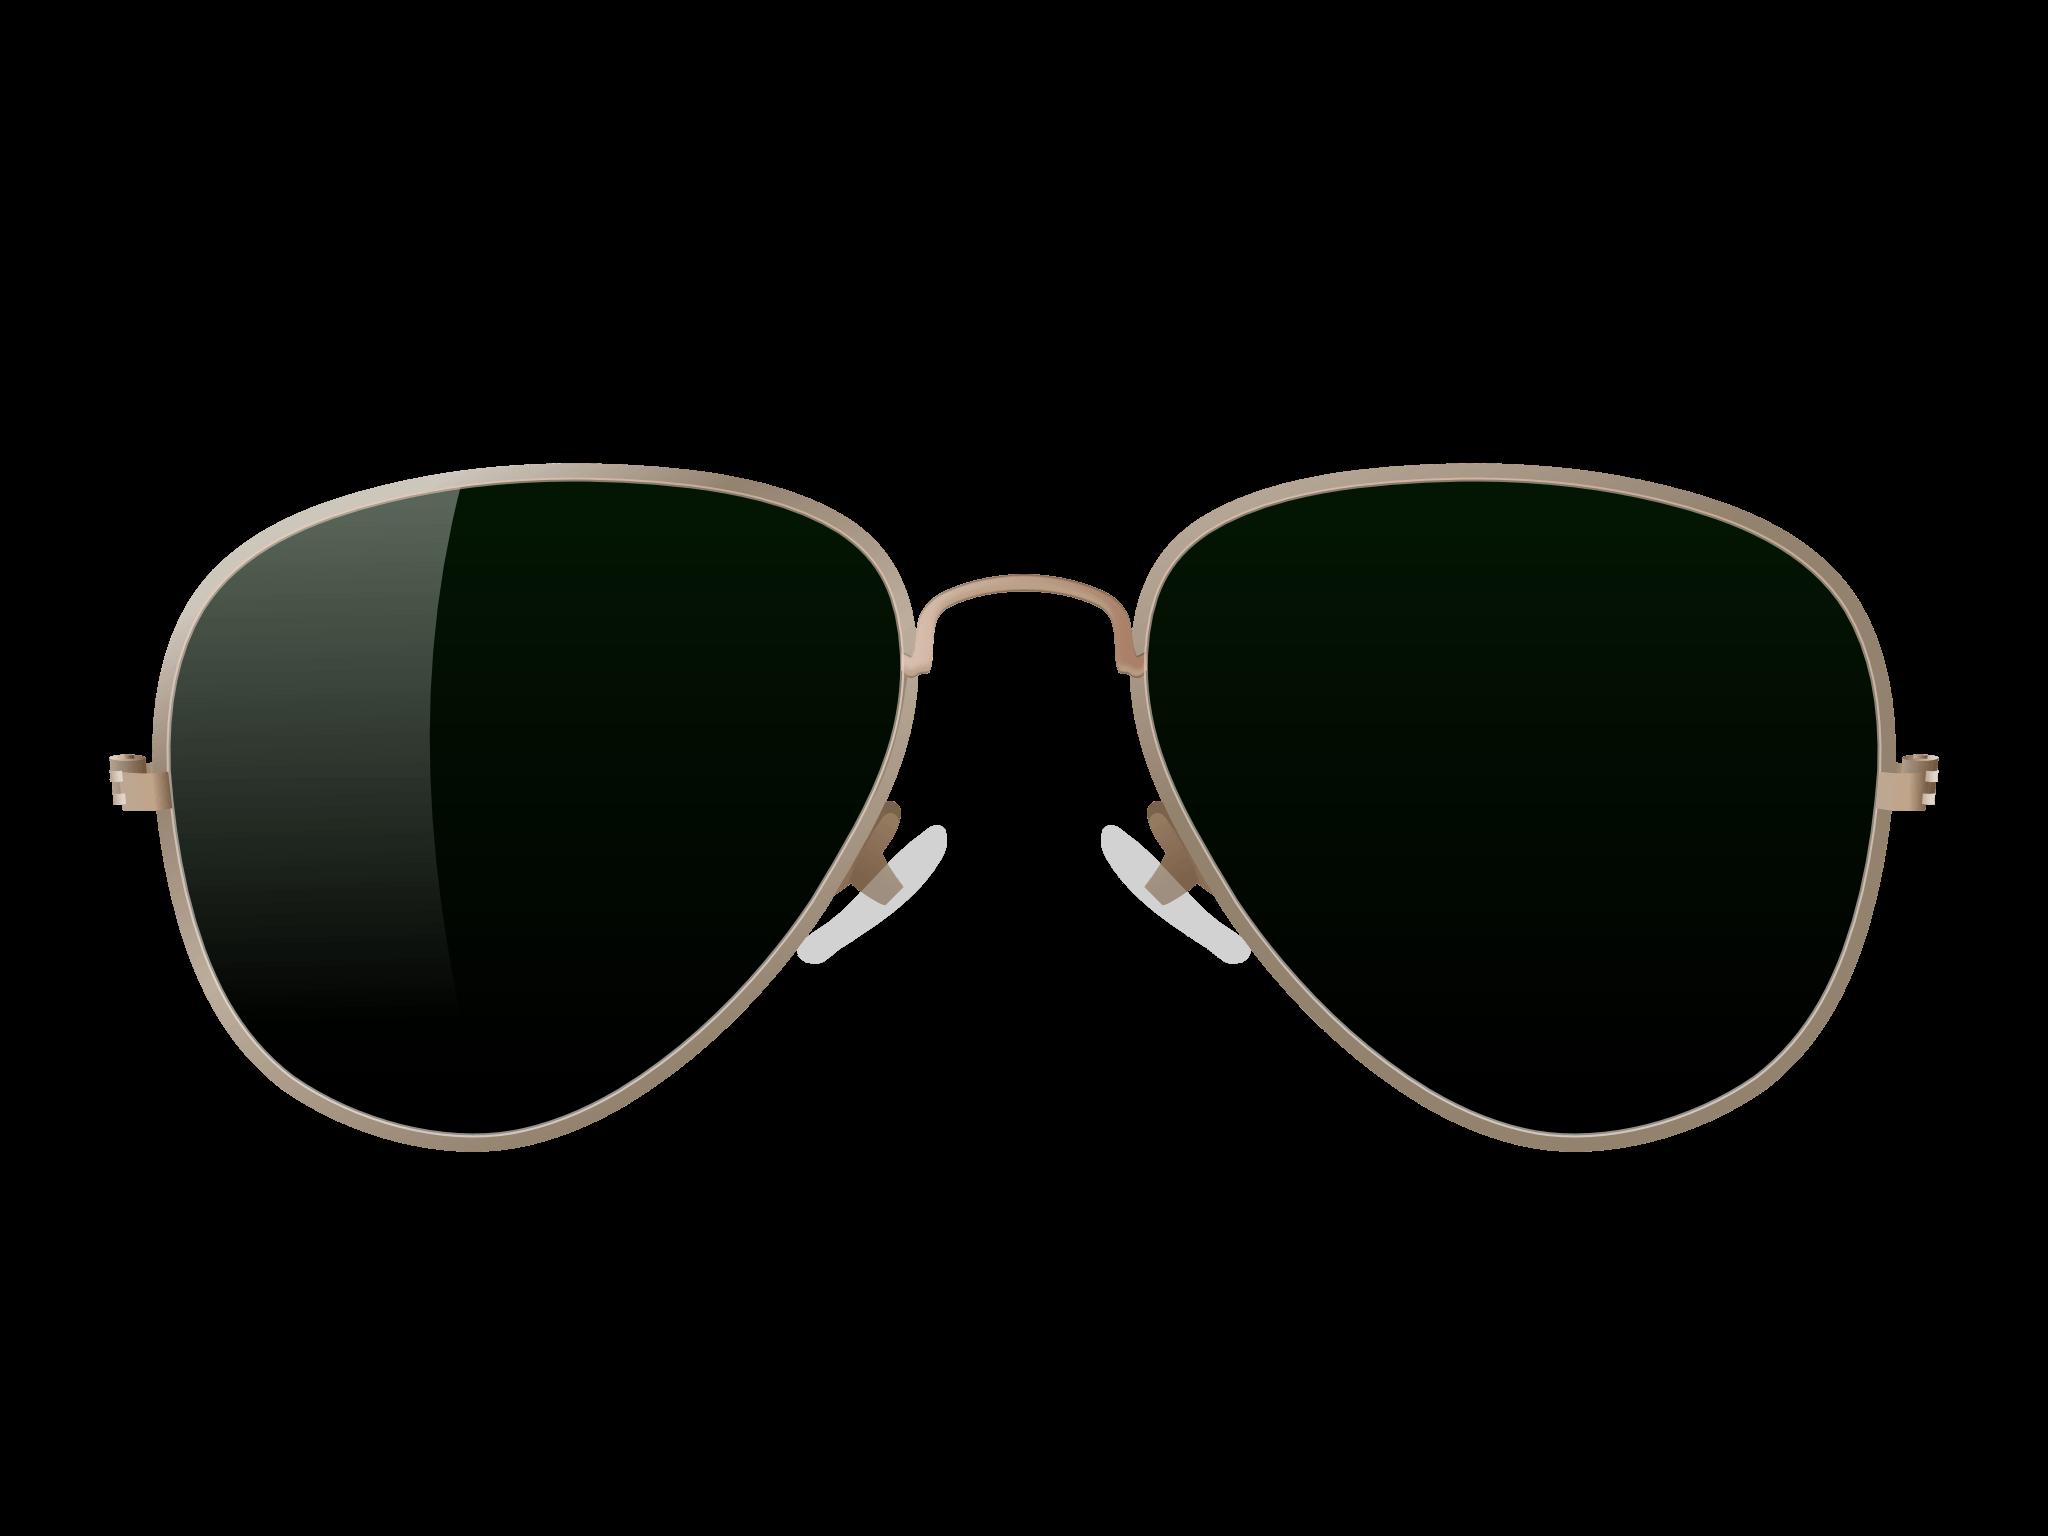 Aviator shades cliparts zone. Eyeglasses clipart animated